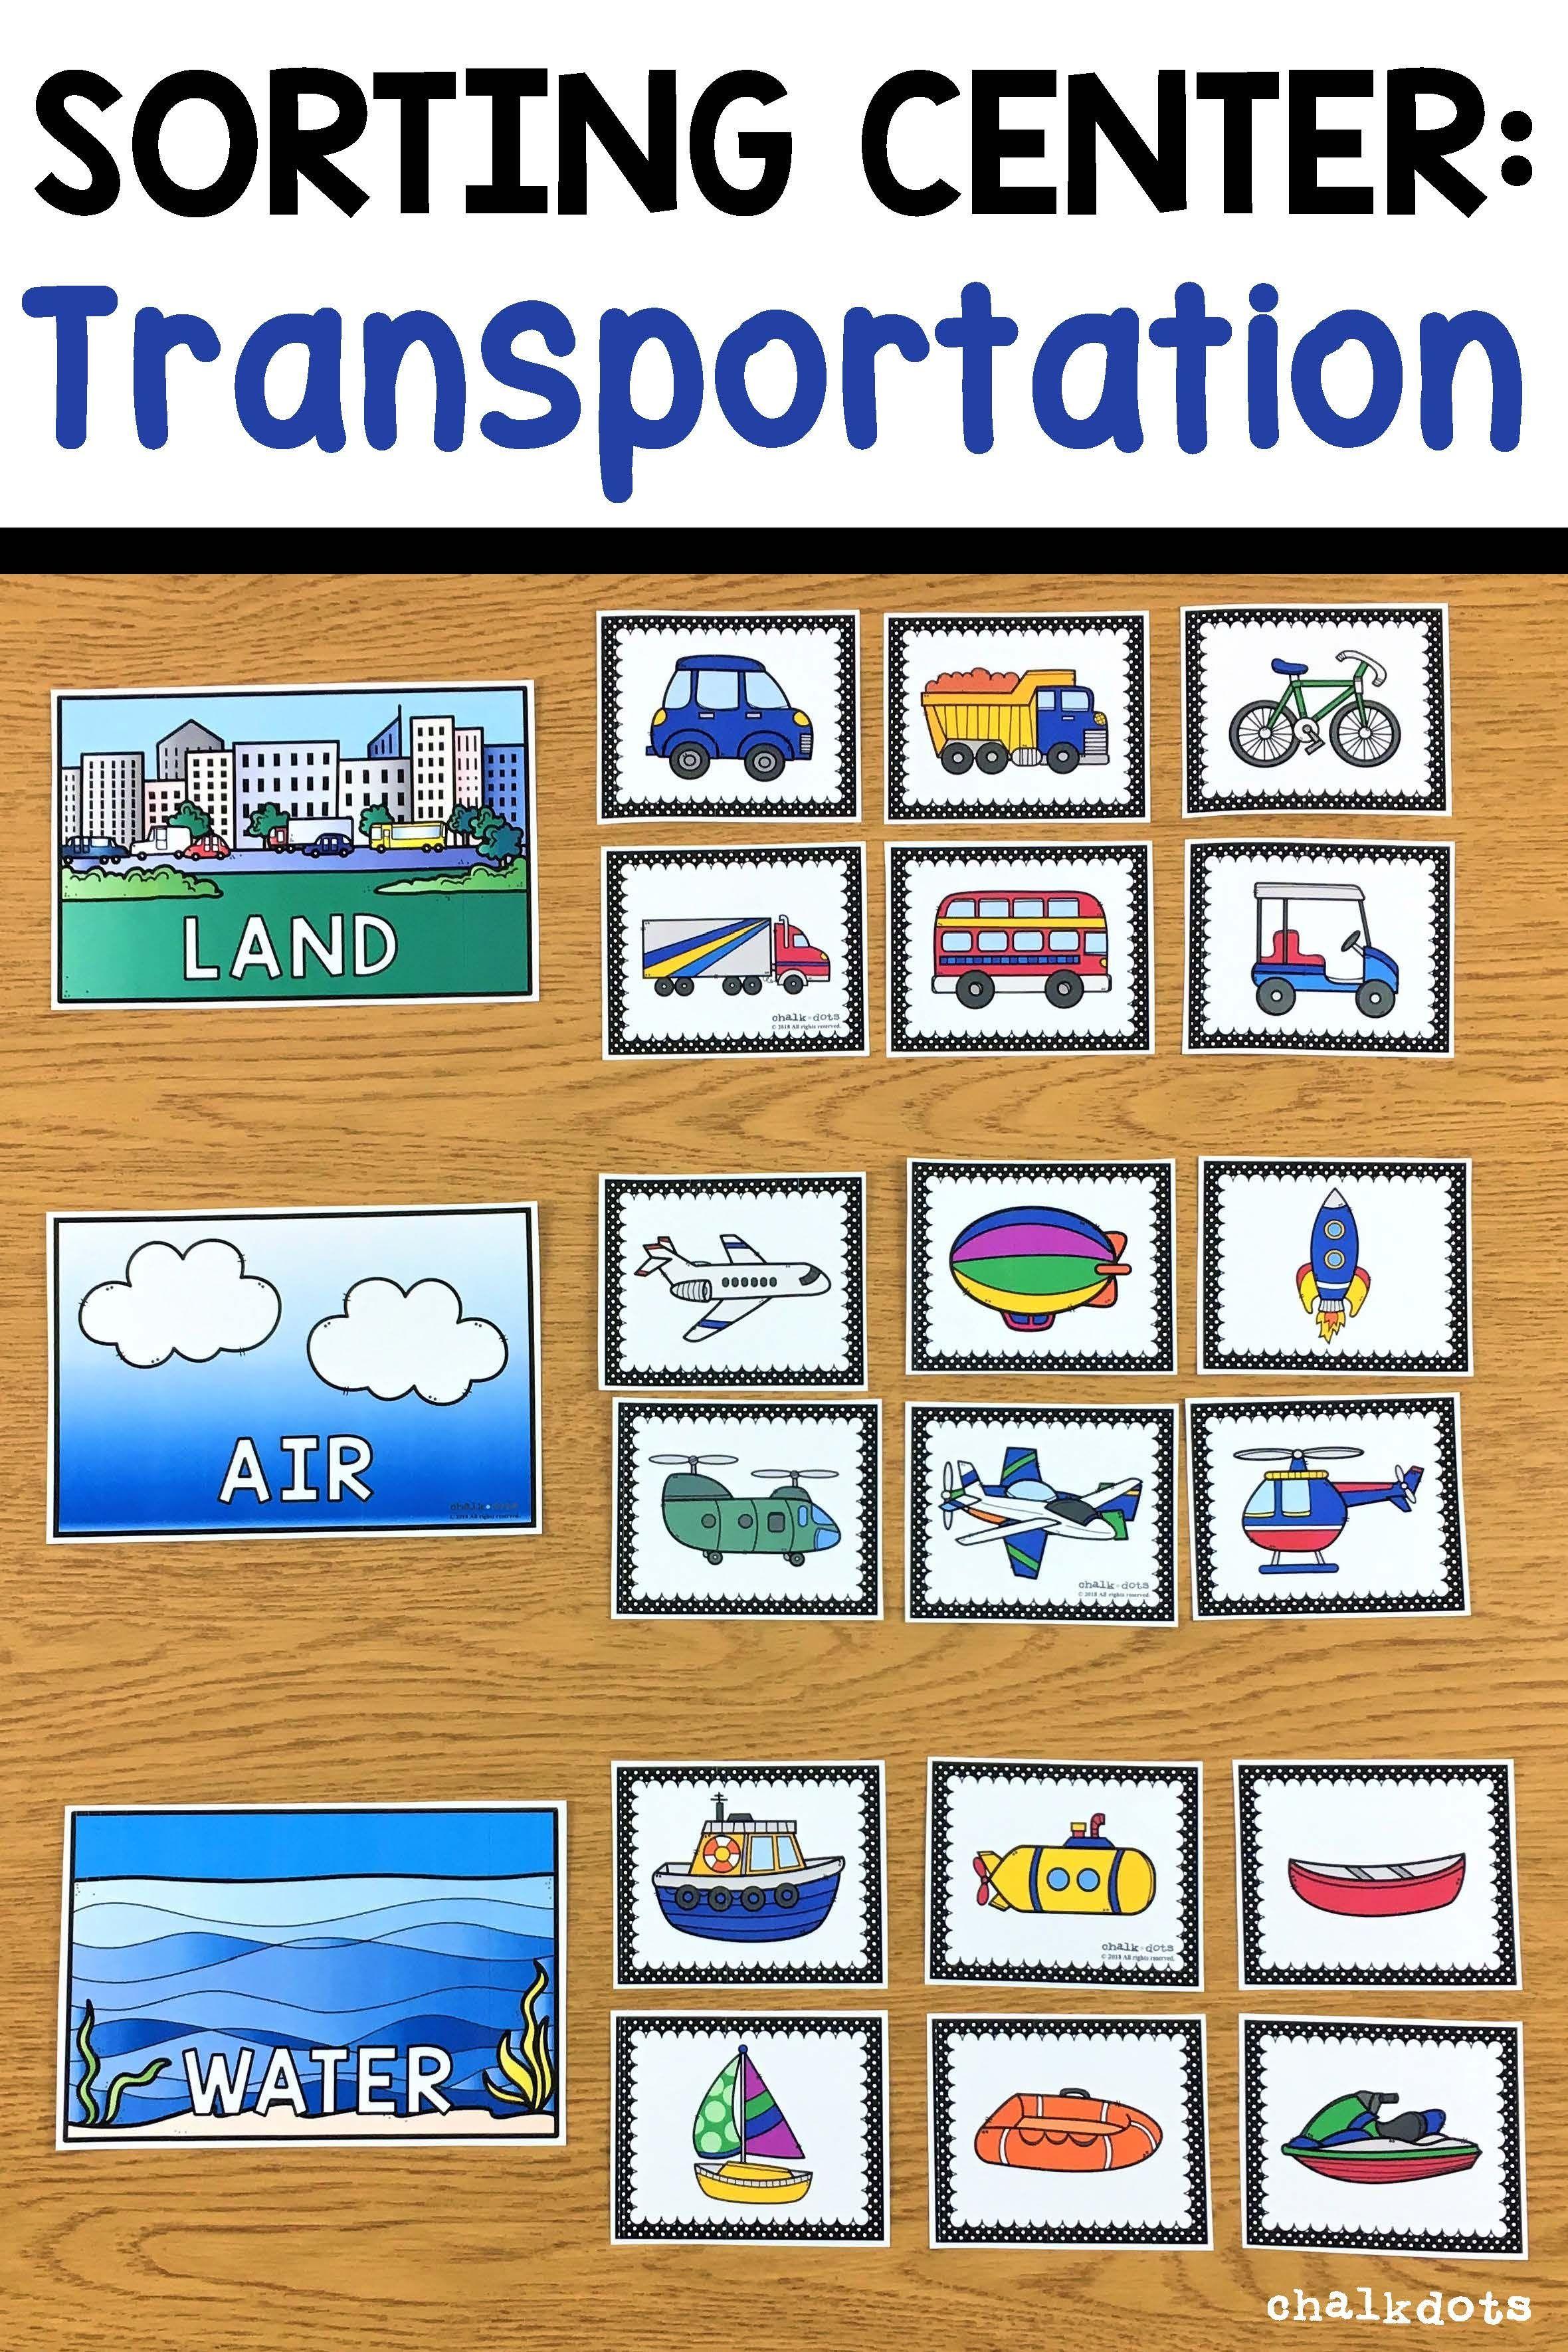 Transportation Sorting